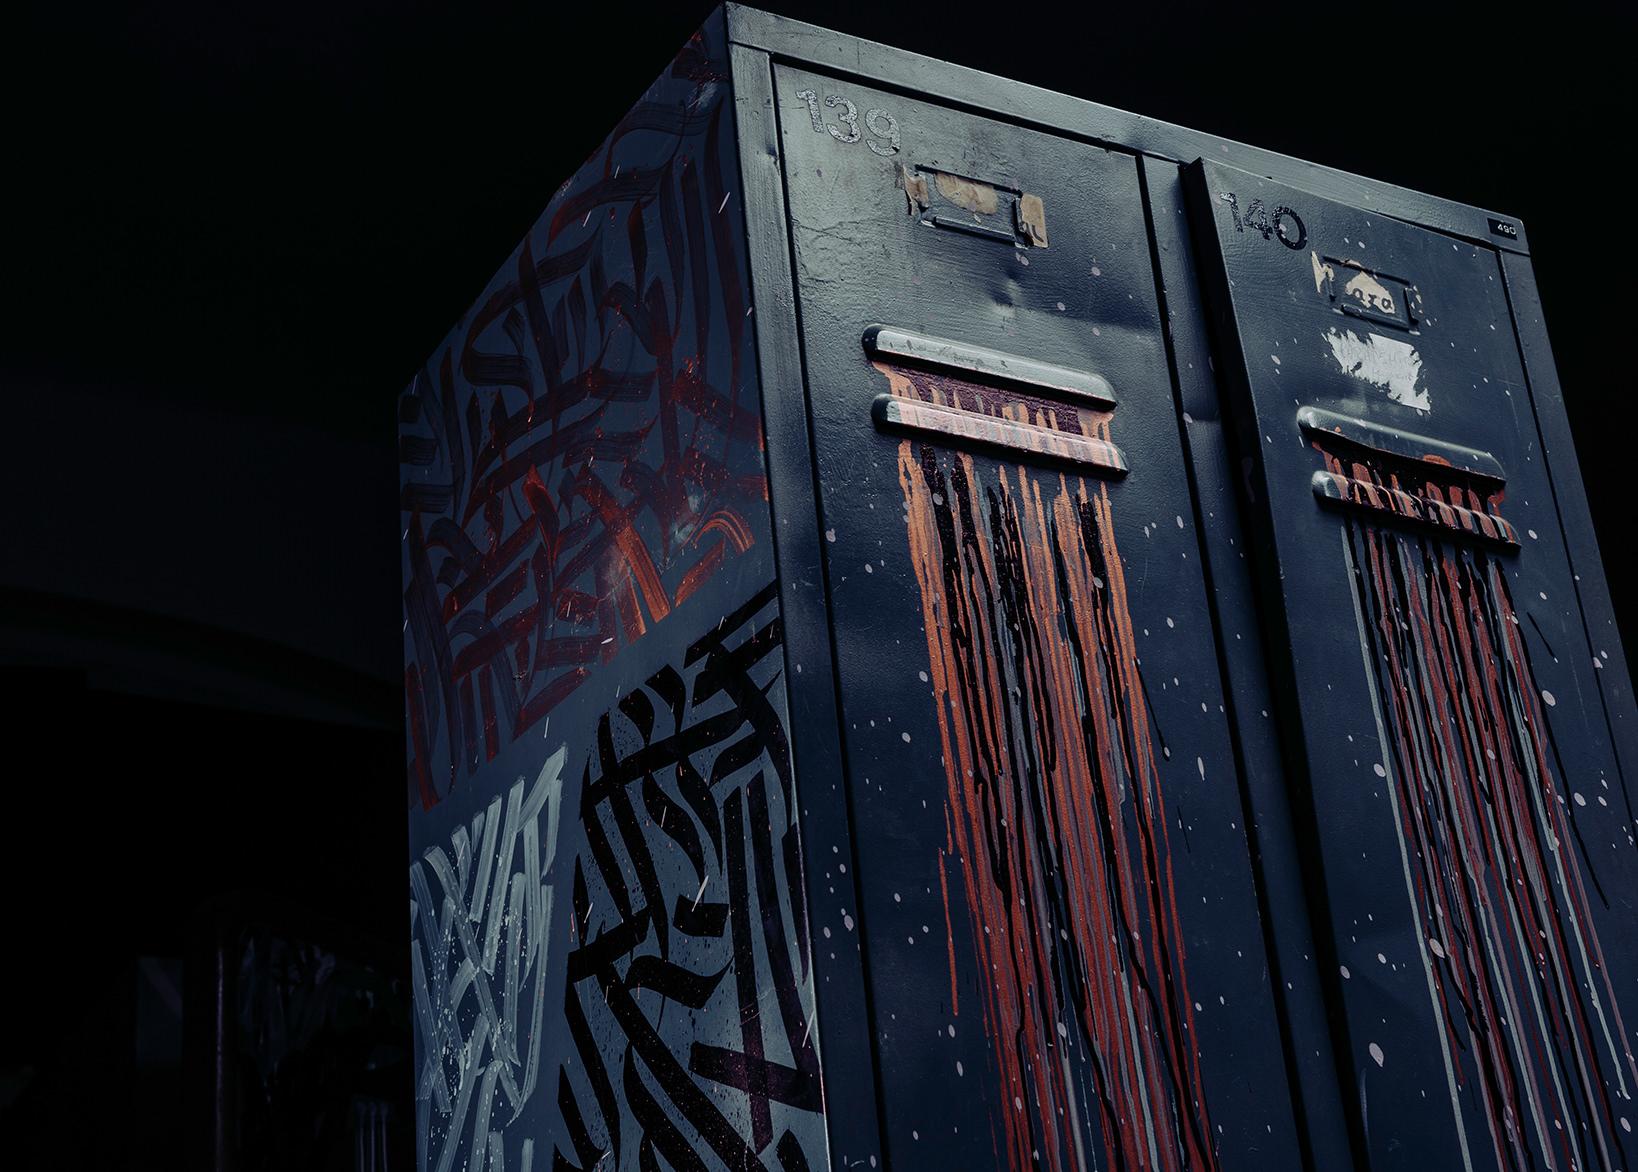 ohP-custom-art-graffiti-streetart-furniture-calligraphy-locker